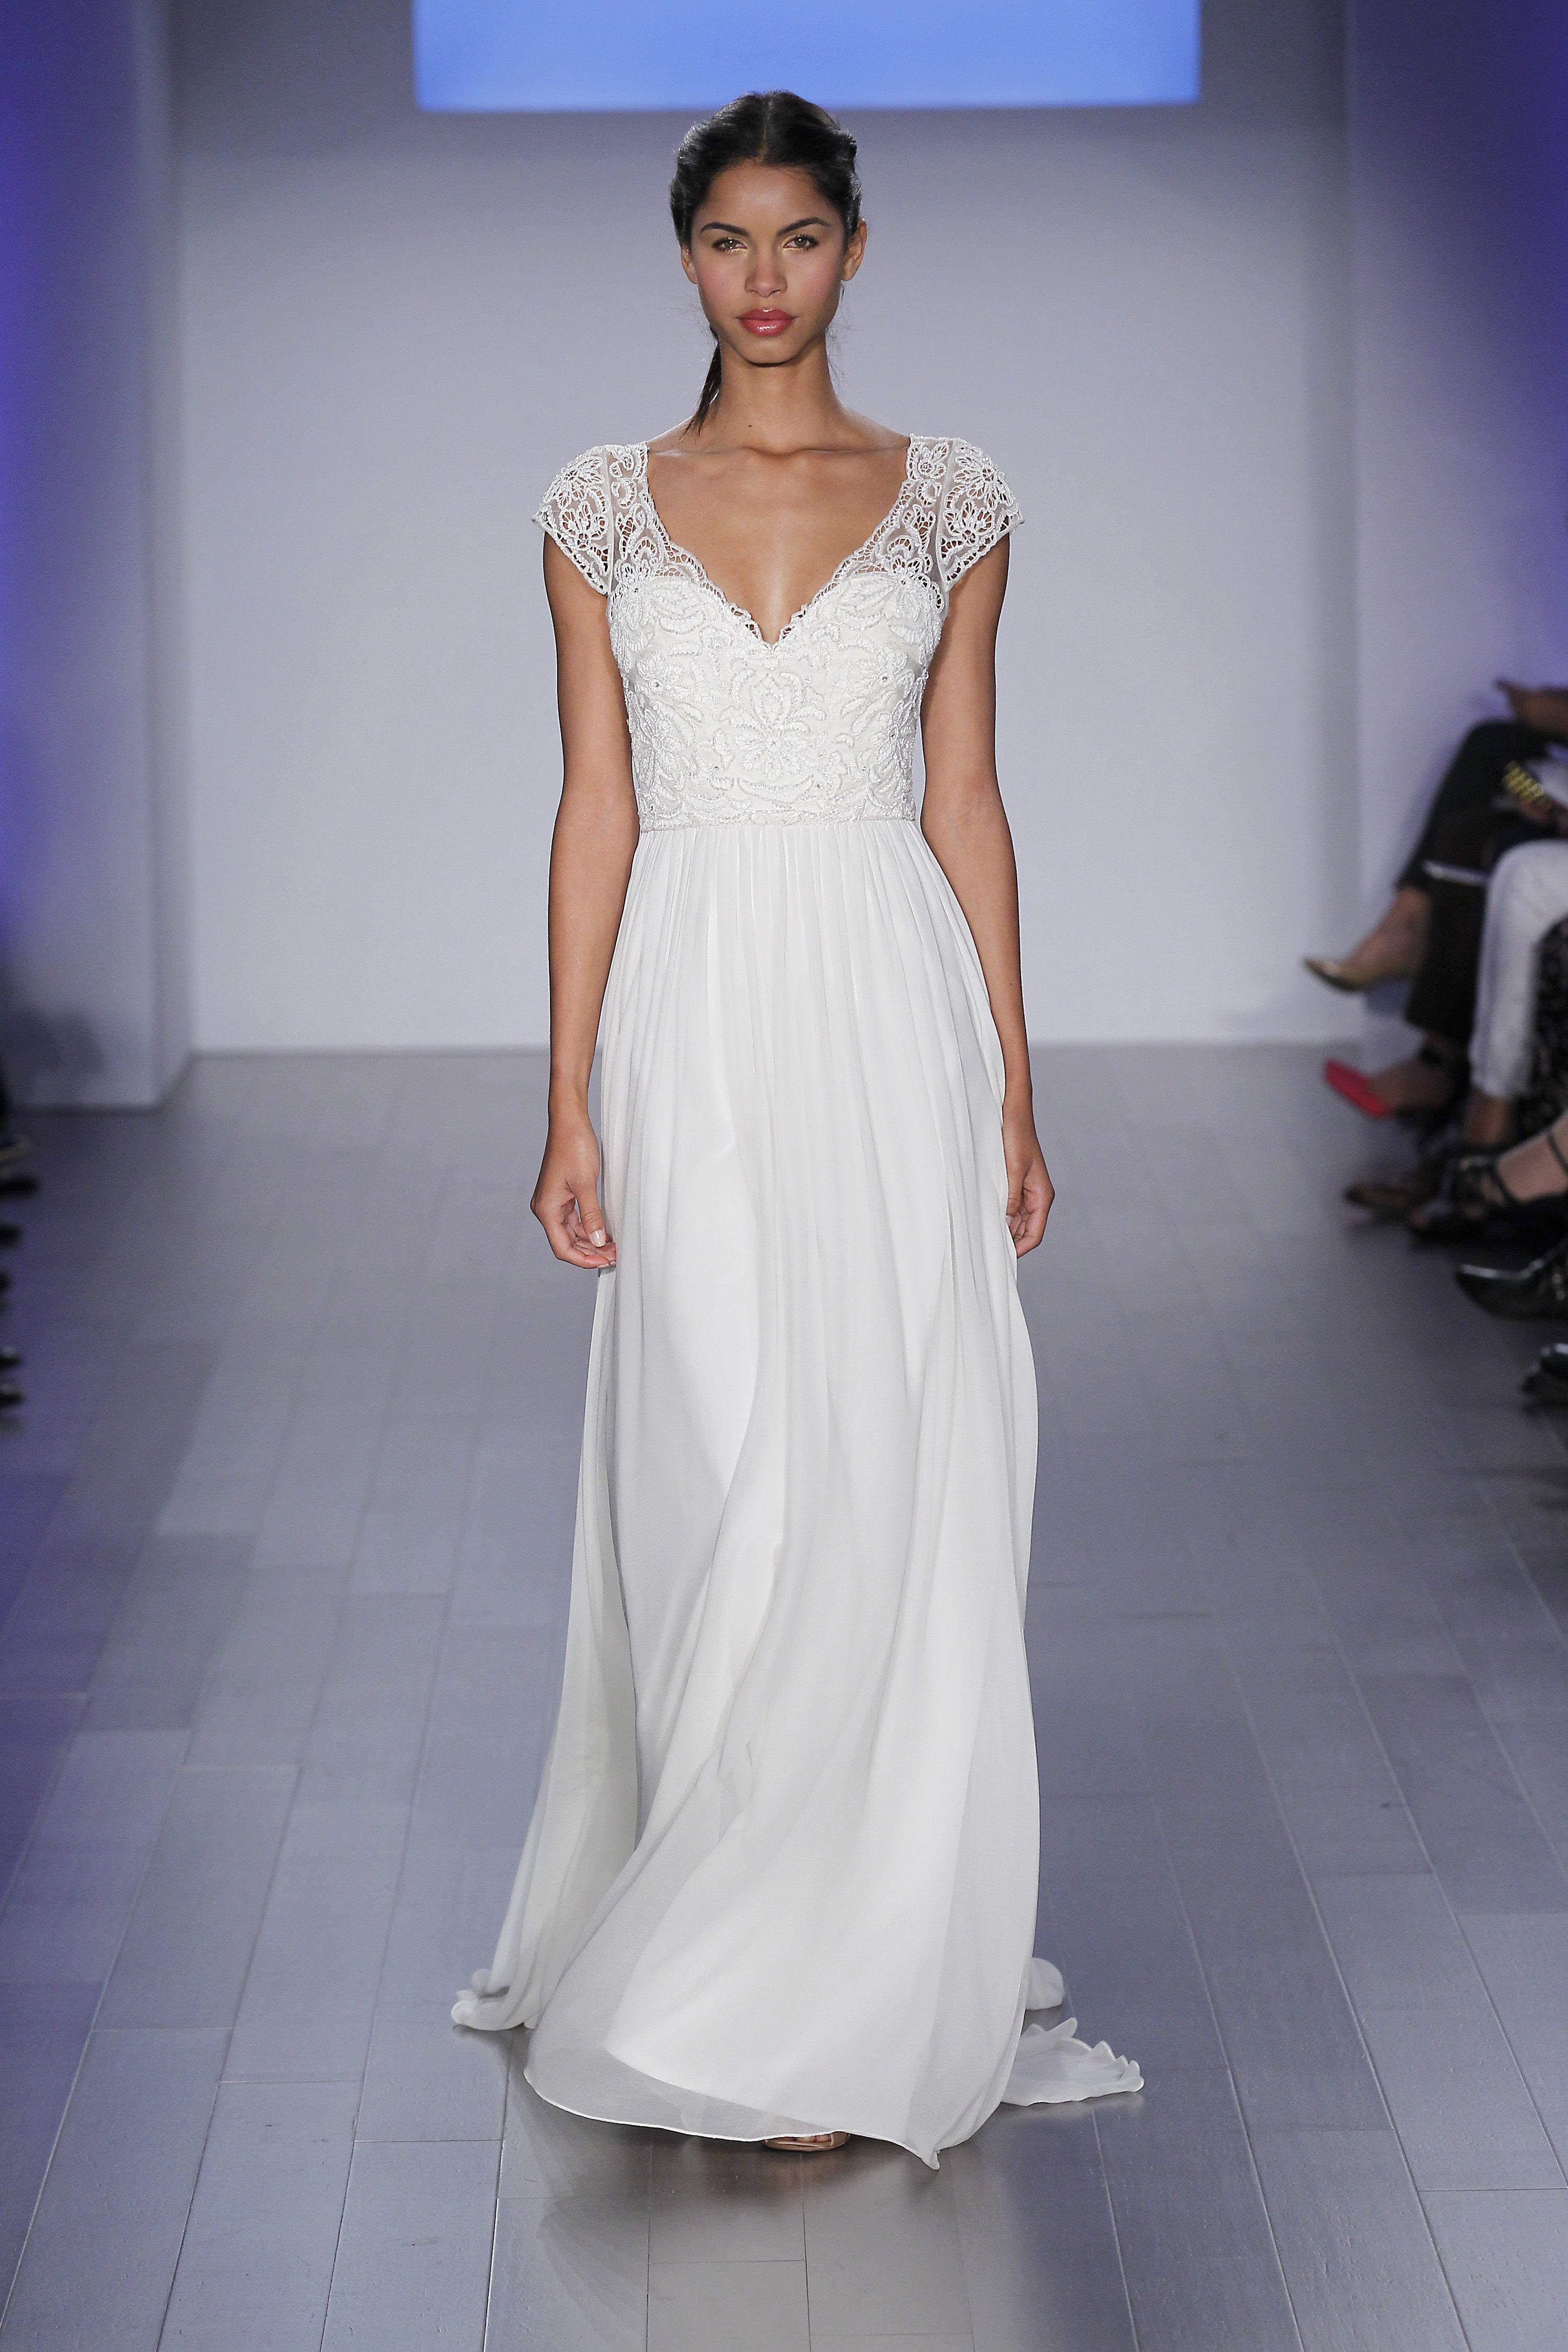 Jim hjelm style 8508 wedding dress outfit short bridal